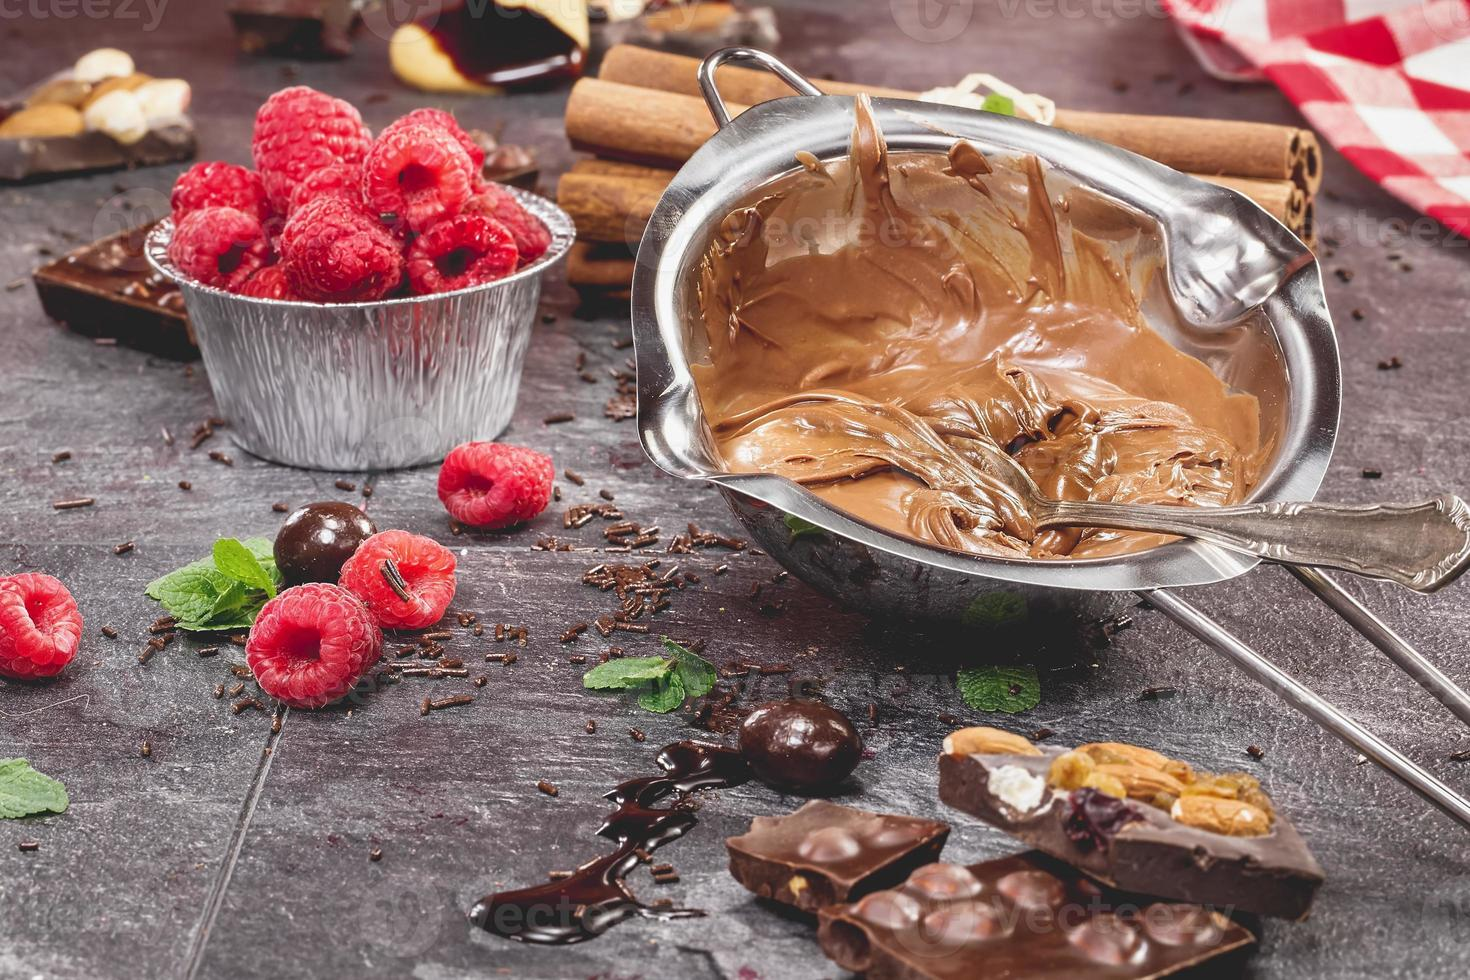 faire un gâteau au chocolat photo